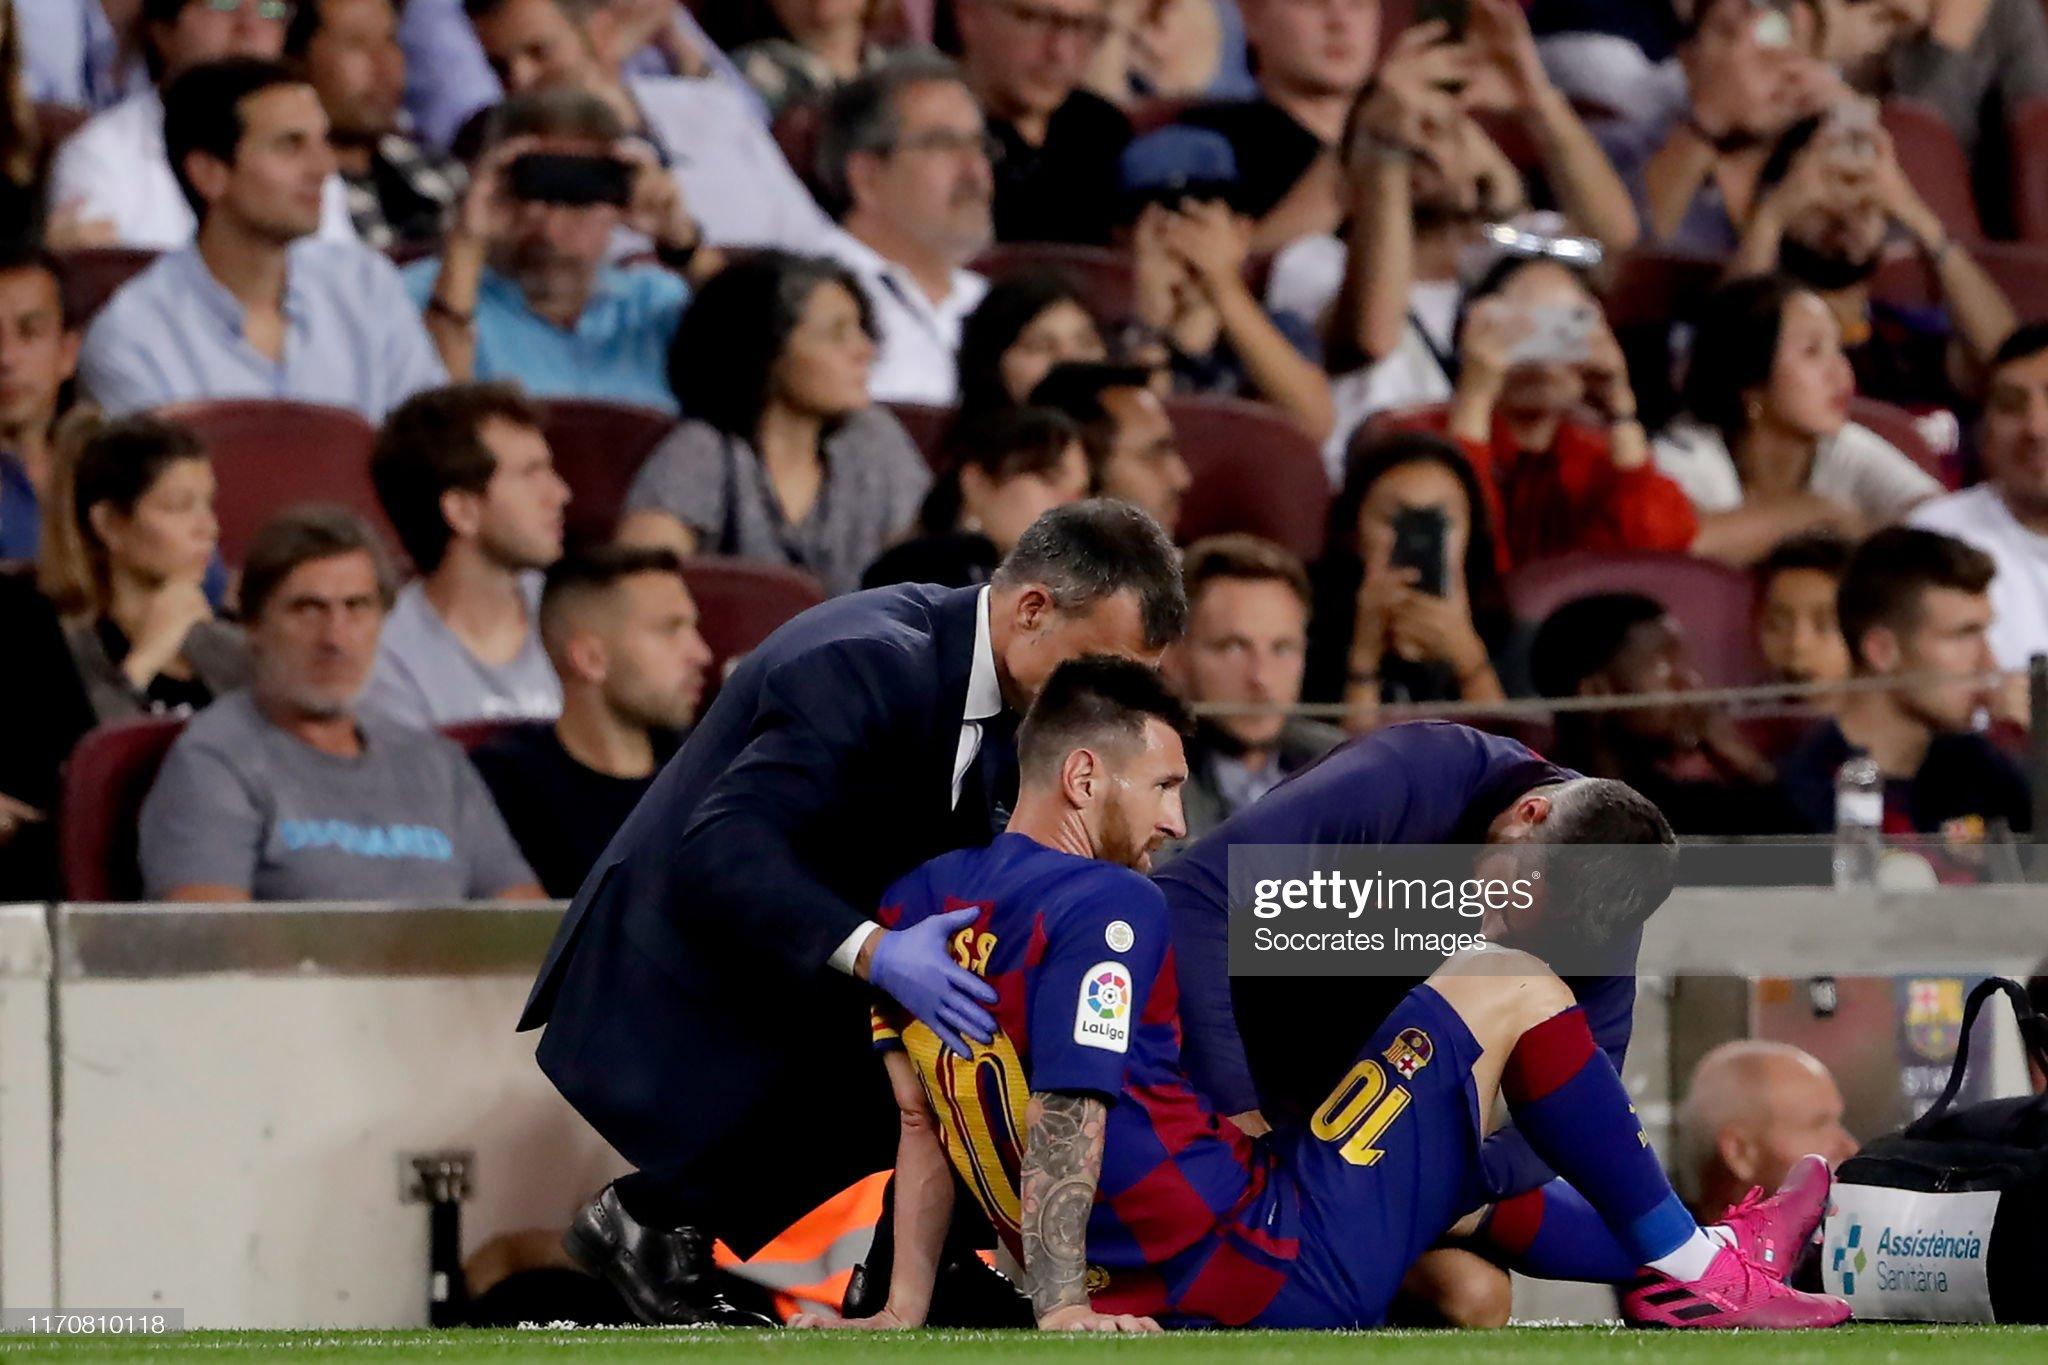 صور مباراة : برشلونة - فياريال 2-1 ( 24-09-2019 )  Lionel-messi-of-fc-barcelona-during-the-la-liga-santander-match-fc-picture-id1170810118?s=2048x2048